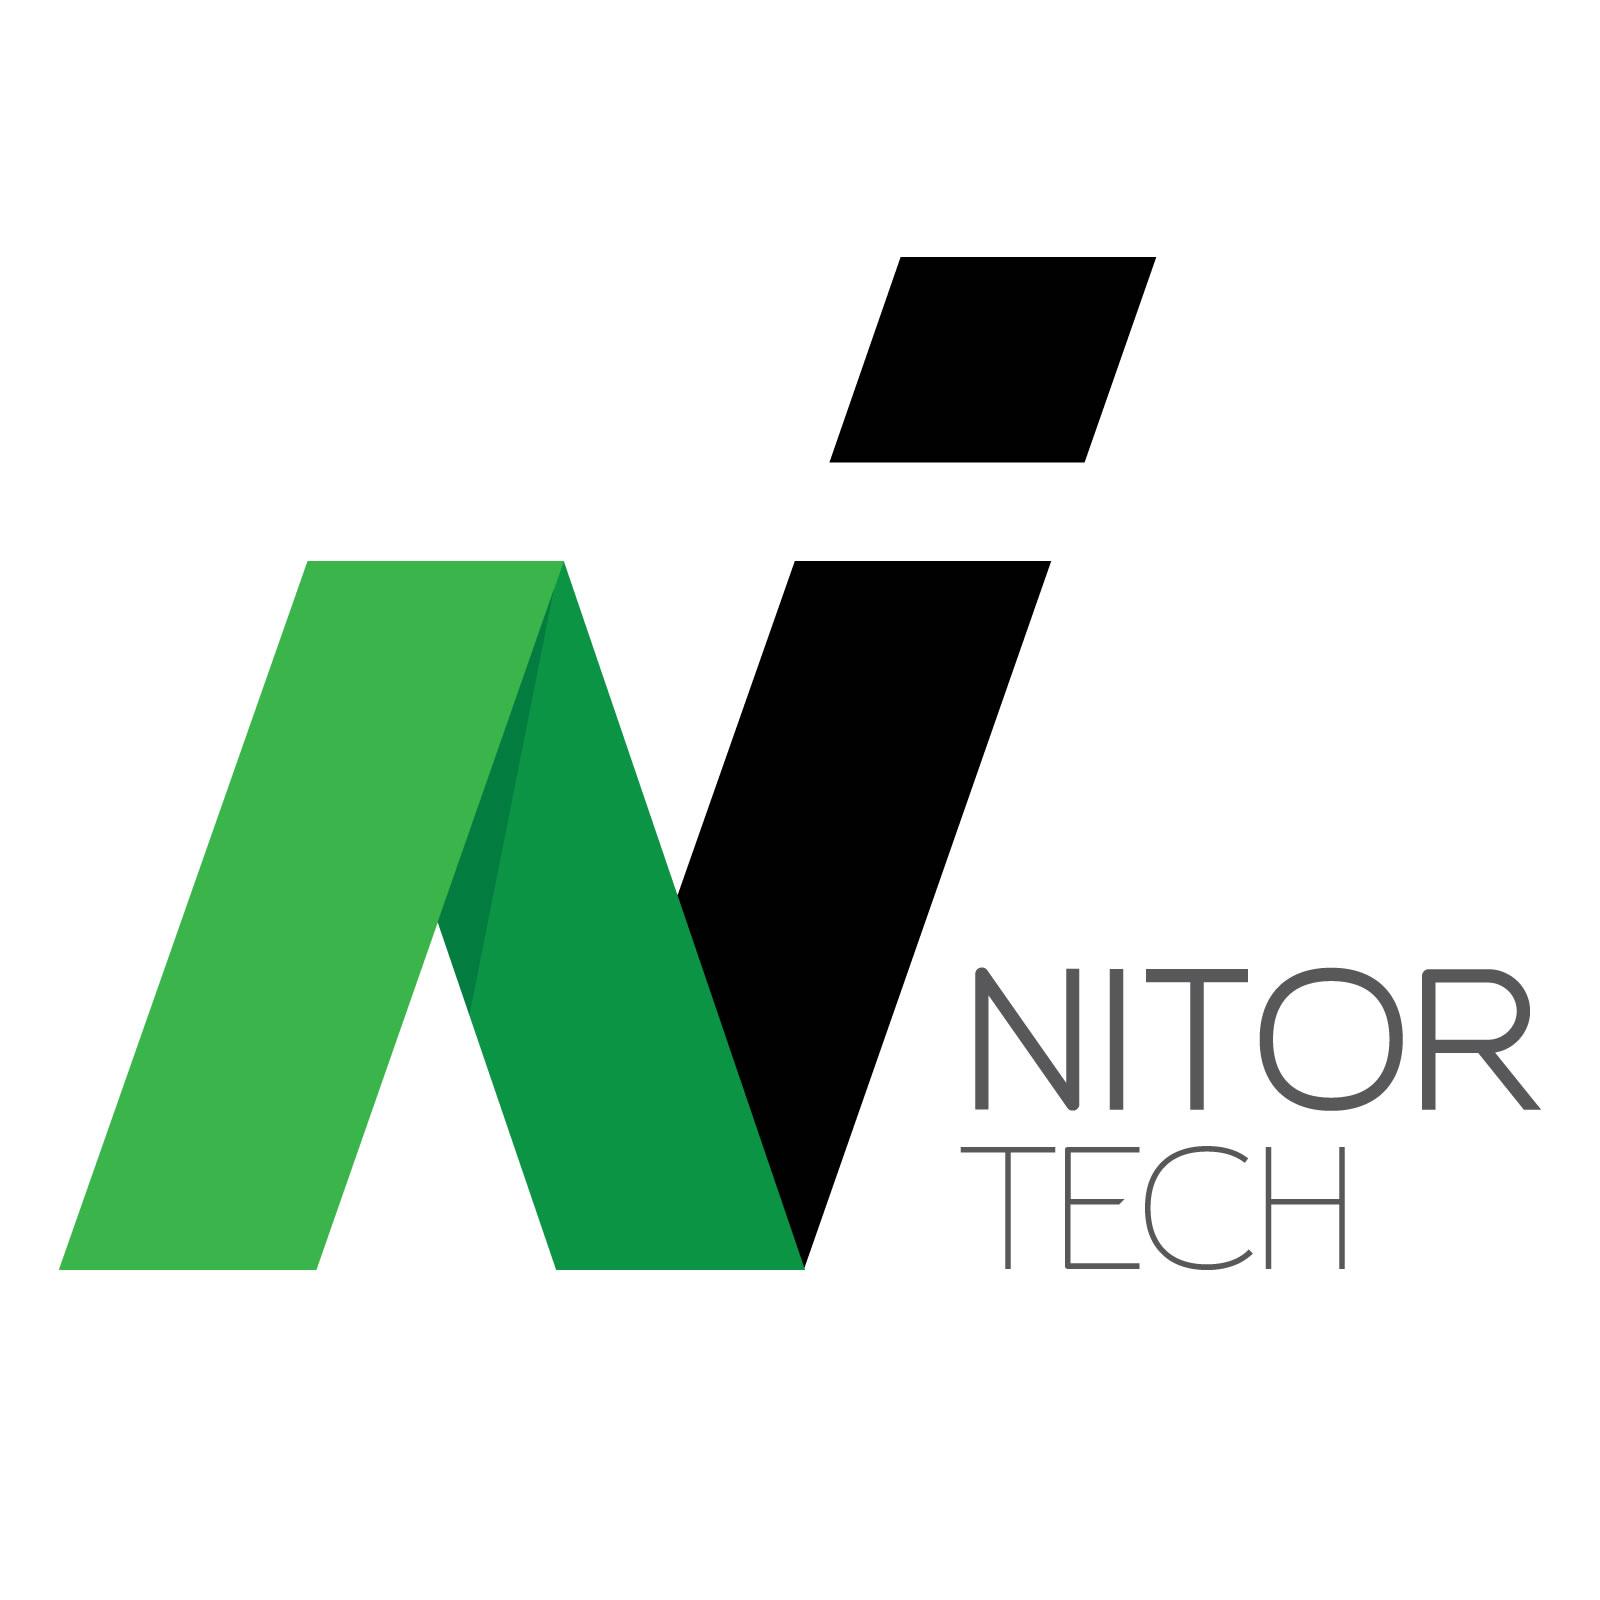 Nitor Tech